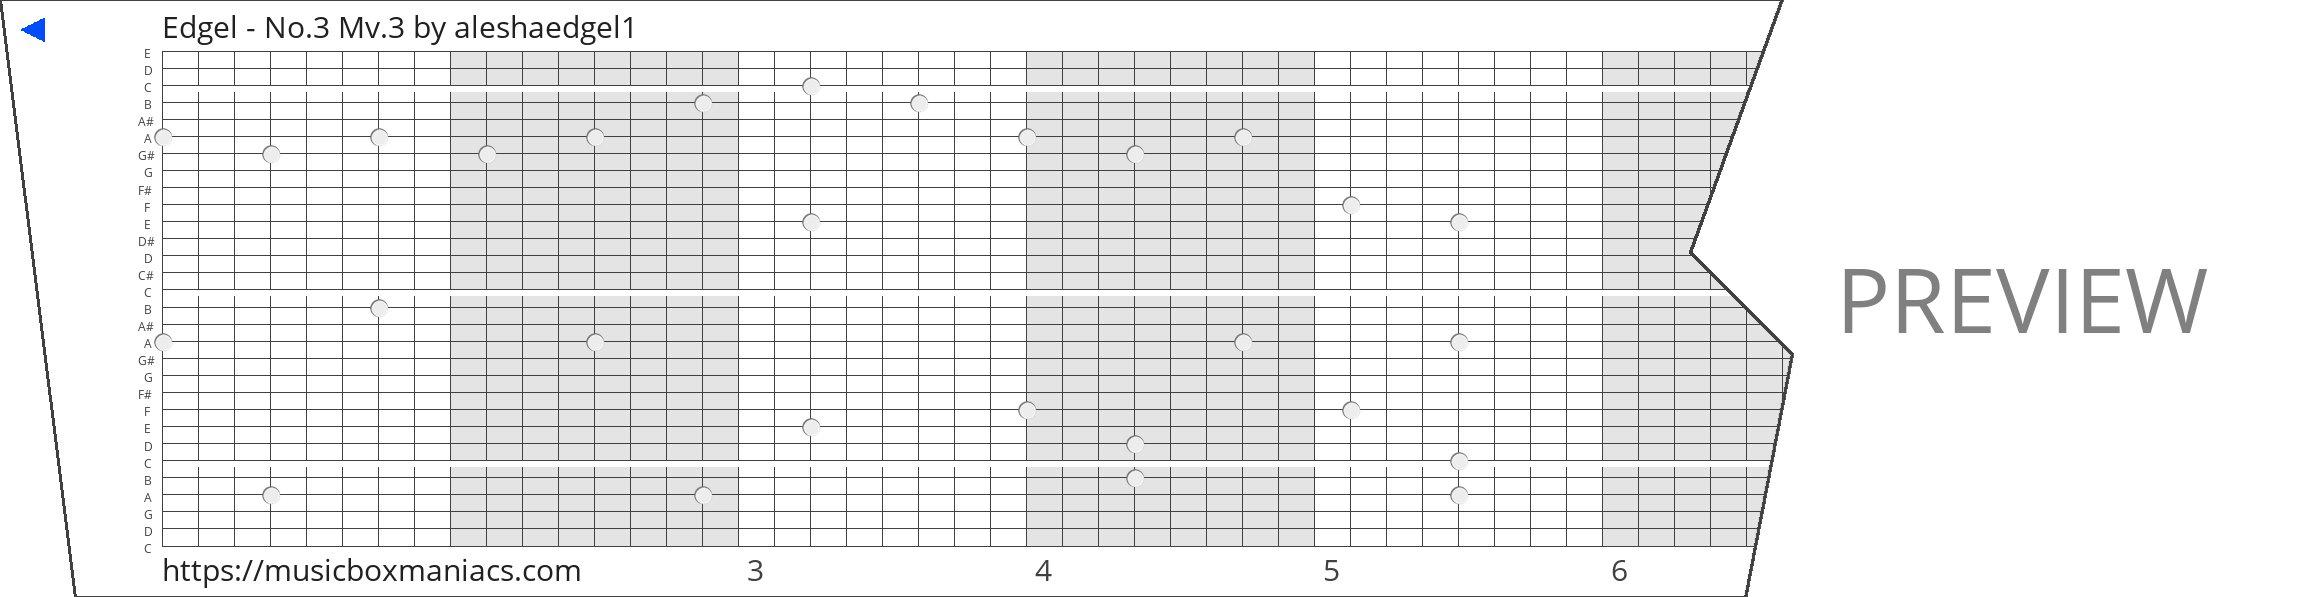 Edgel - No.3 Mv.3 30 note music box paper strip